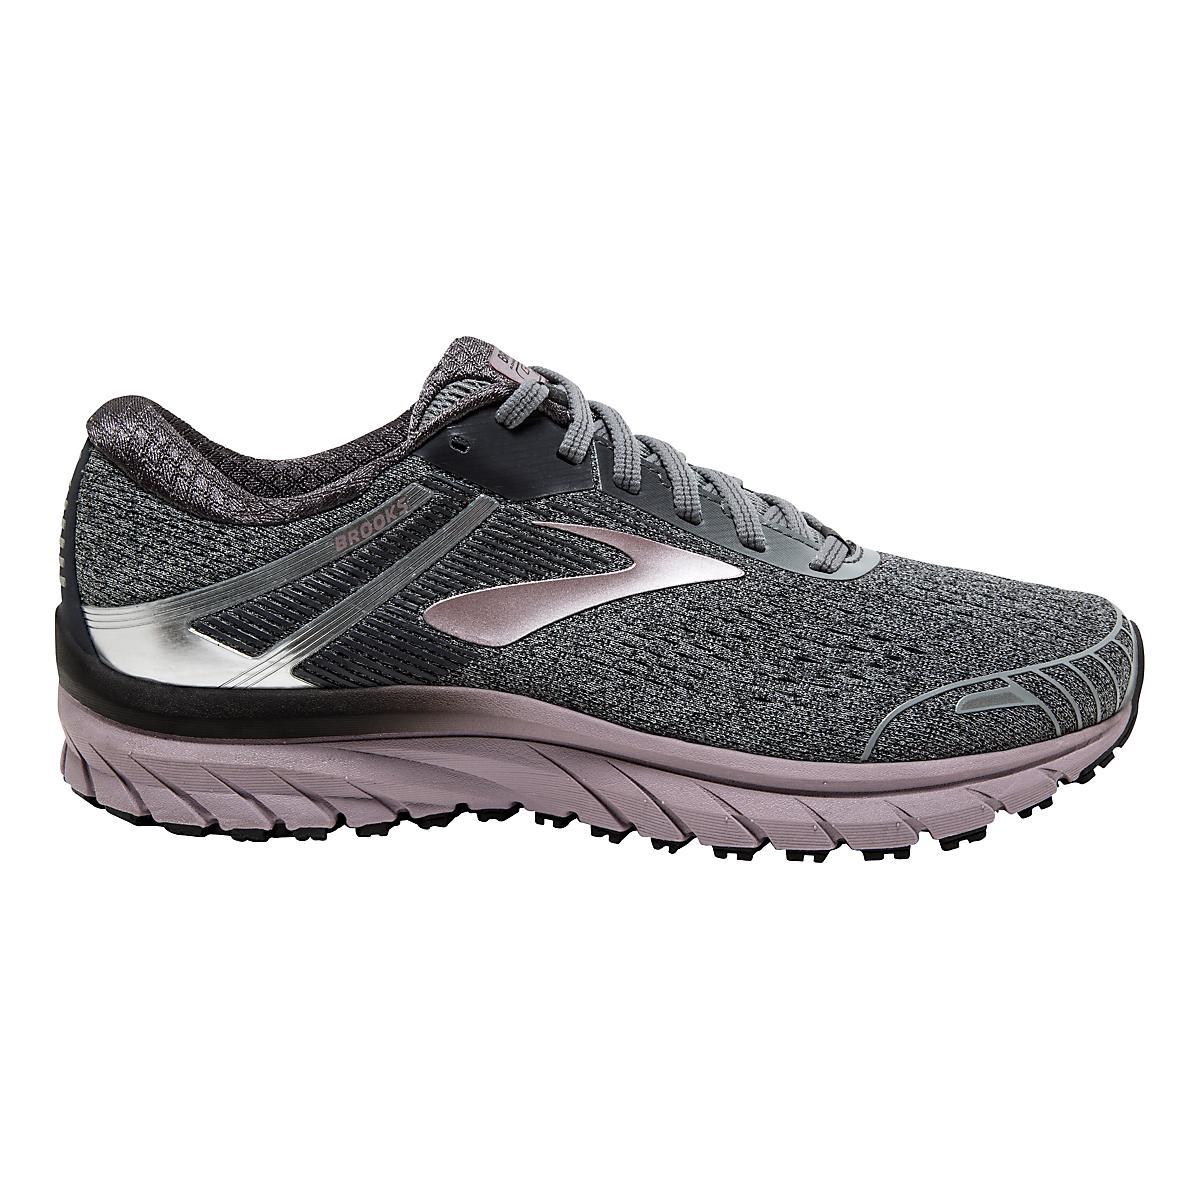 Womens Brooks Adrenaline GTS 18 Running Shoe at Road